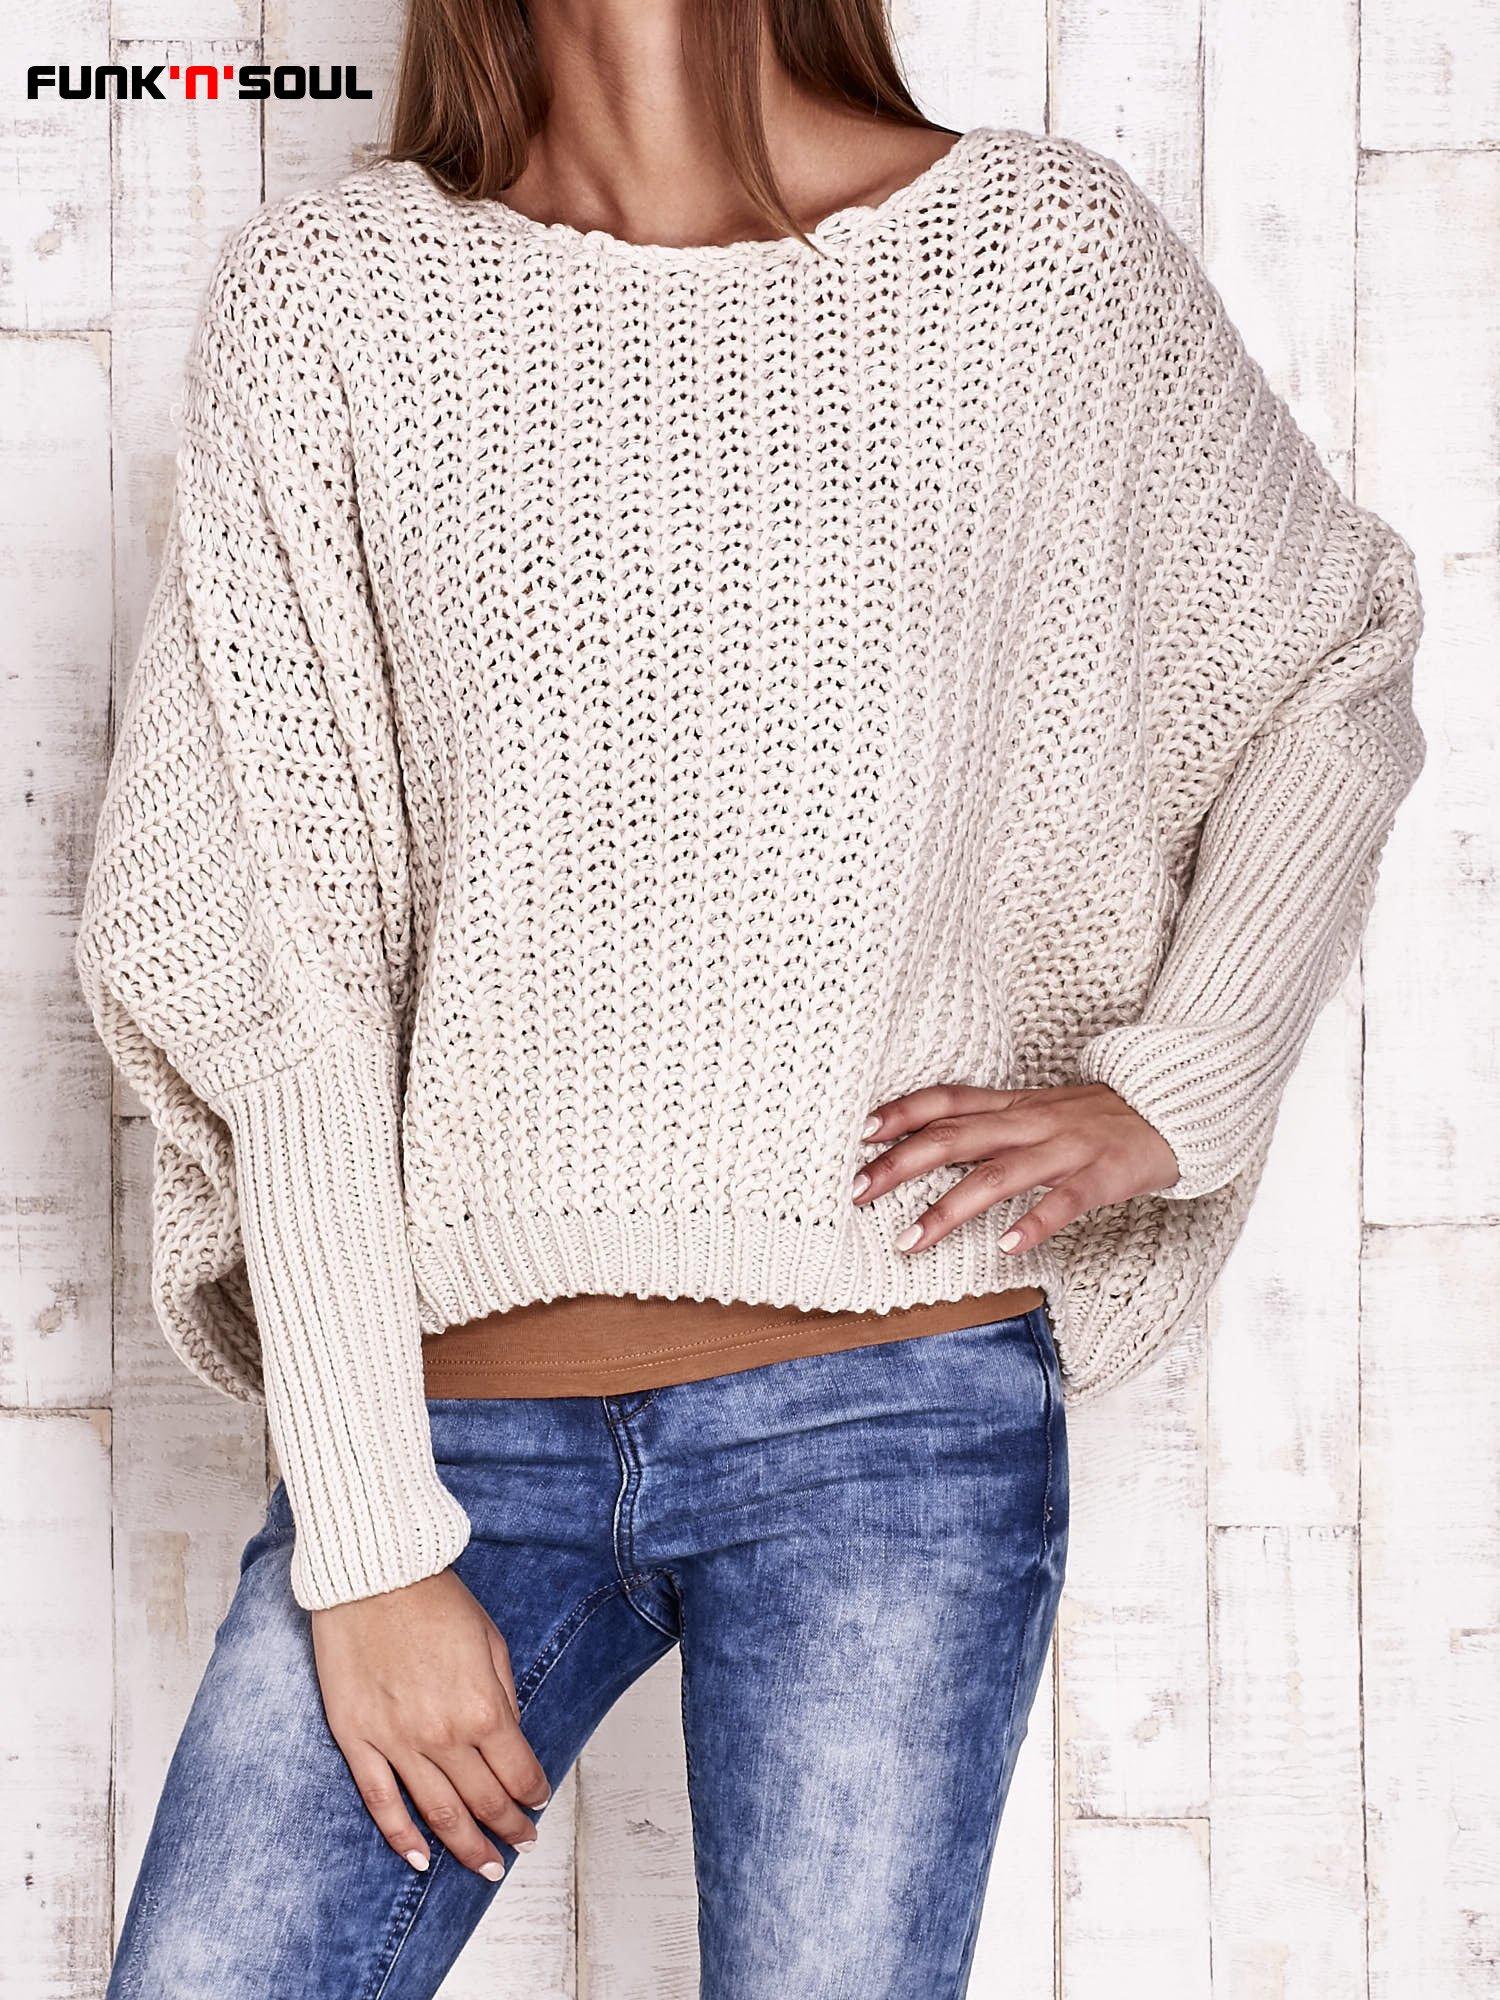 Ecru dziergany sweter oversize FUNK N SOUL                                  zdj.                                  2